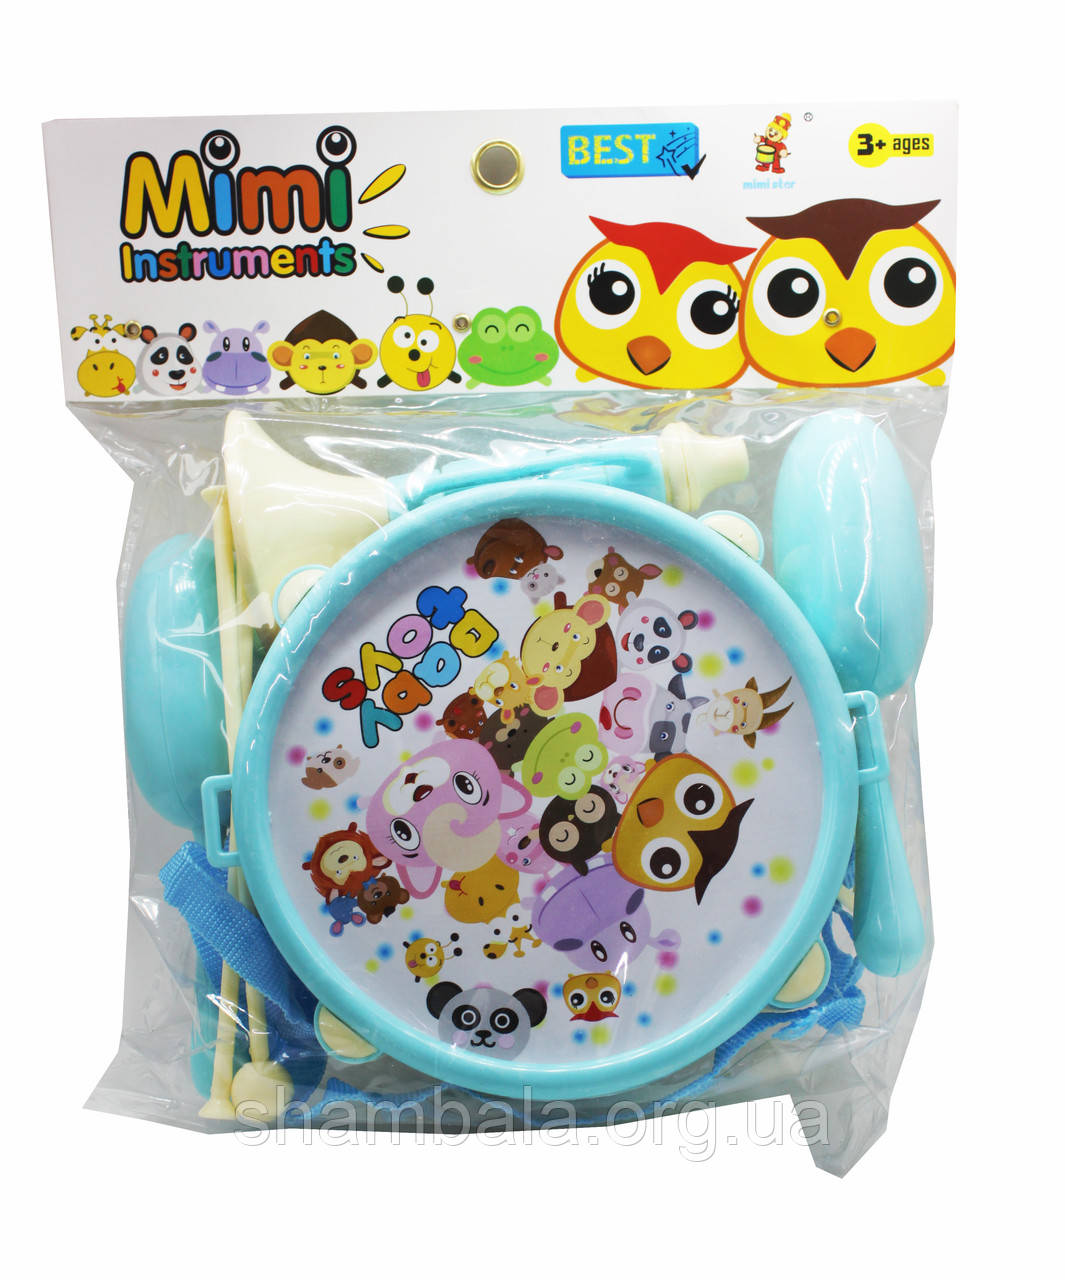 "Музыкальный барабан Baby toys ""Mimi insstruments"" голубой (067858)"